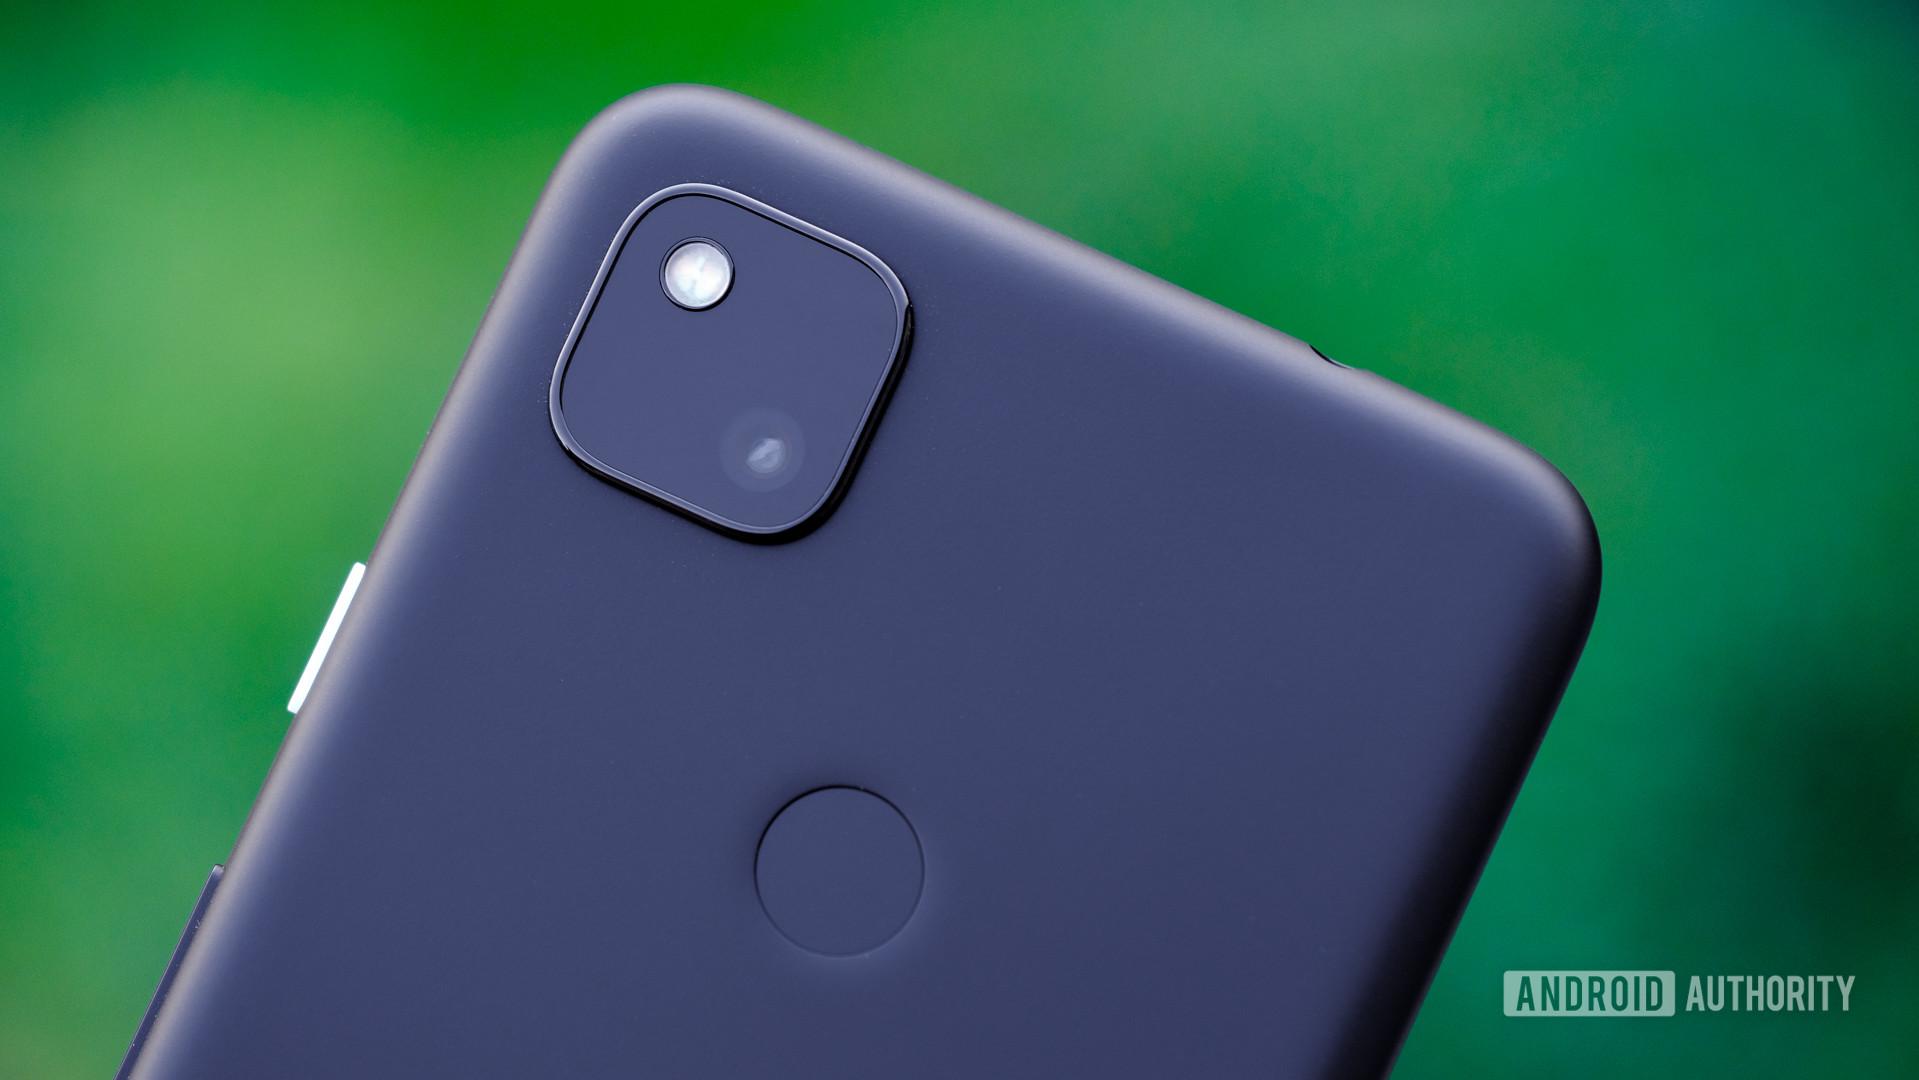 Google Pixel 4a back camera and fingerprint macro